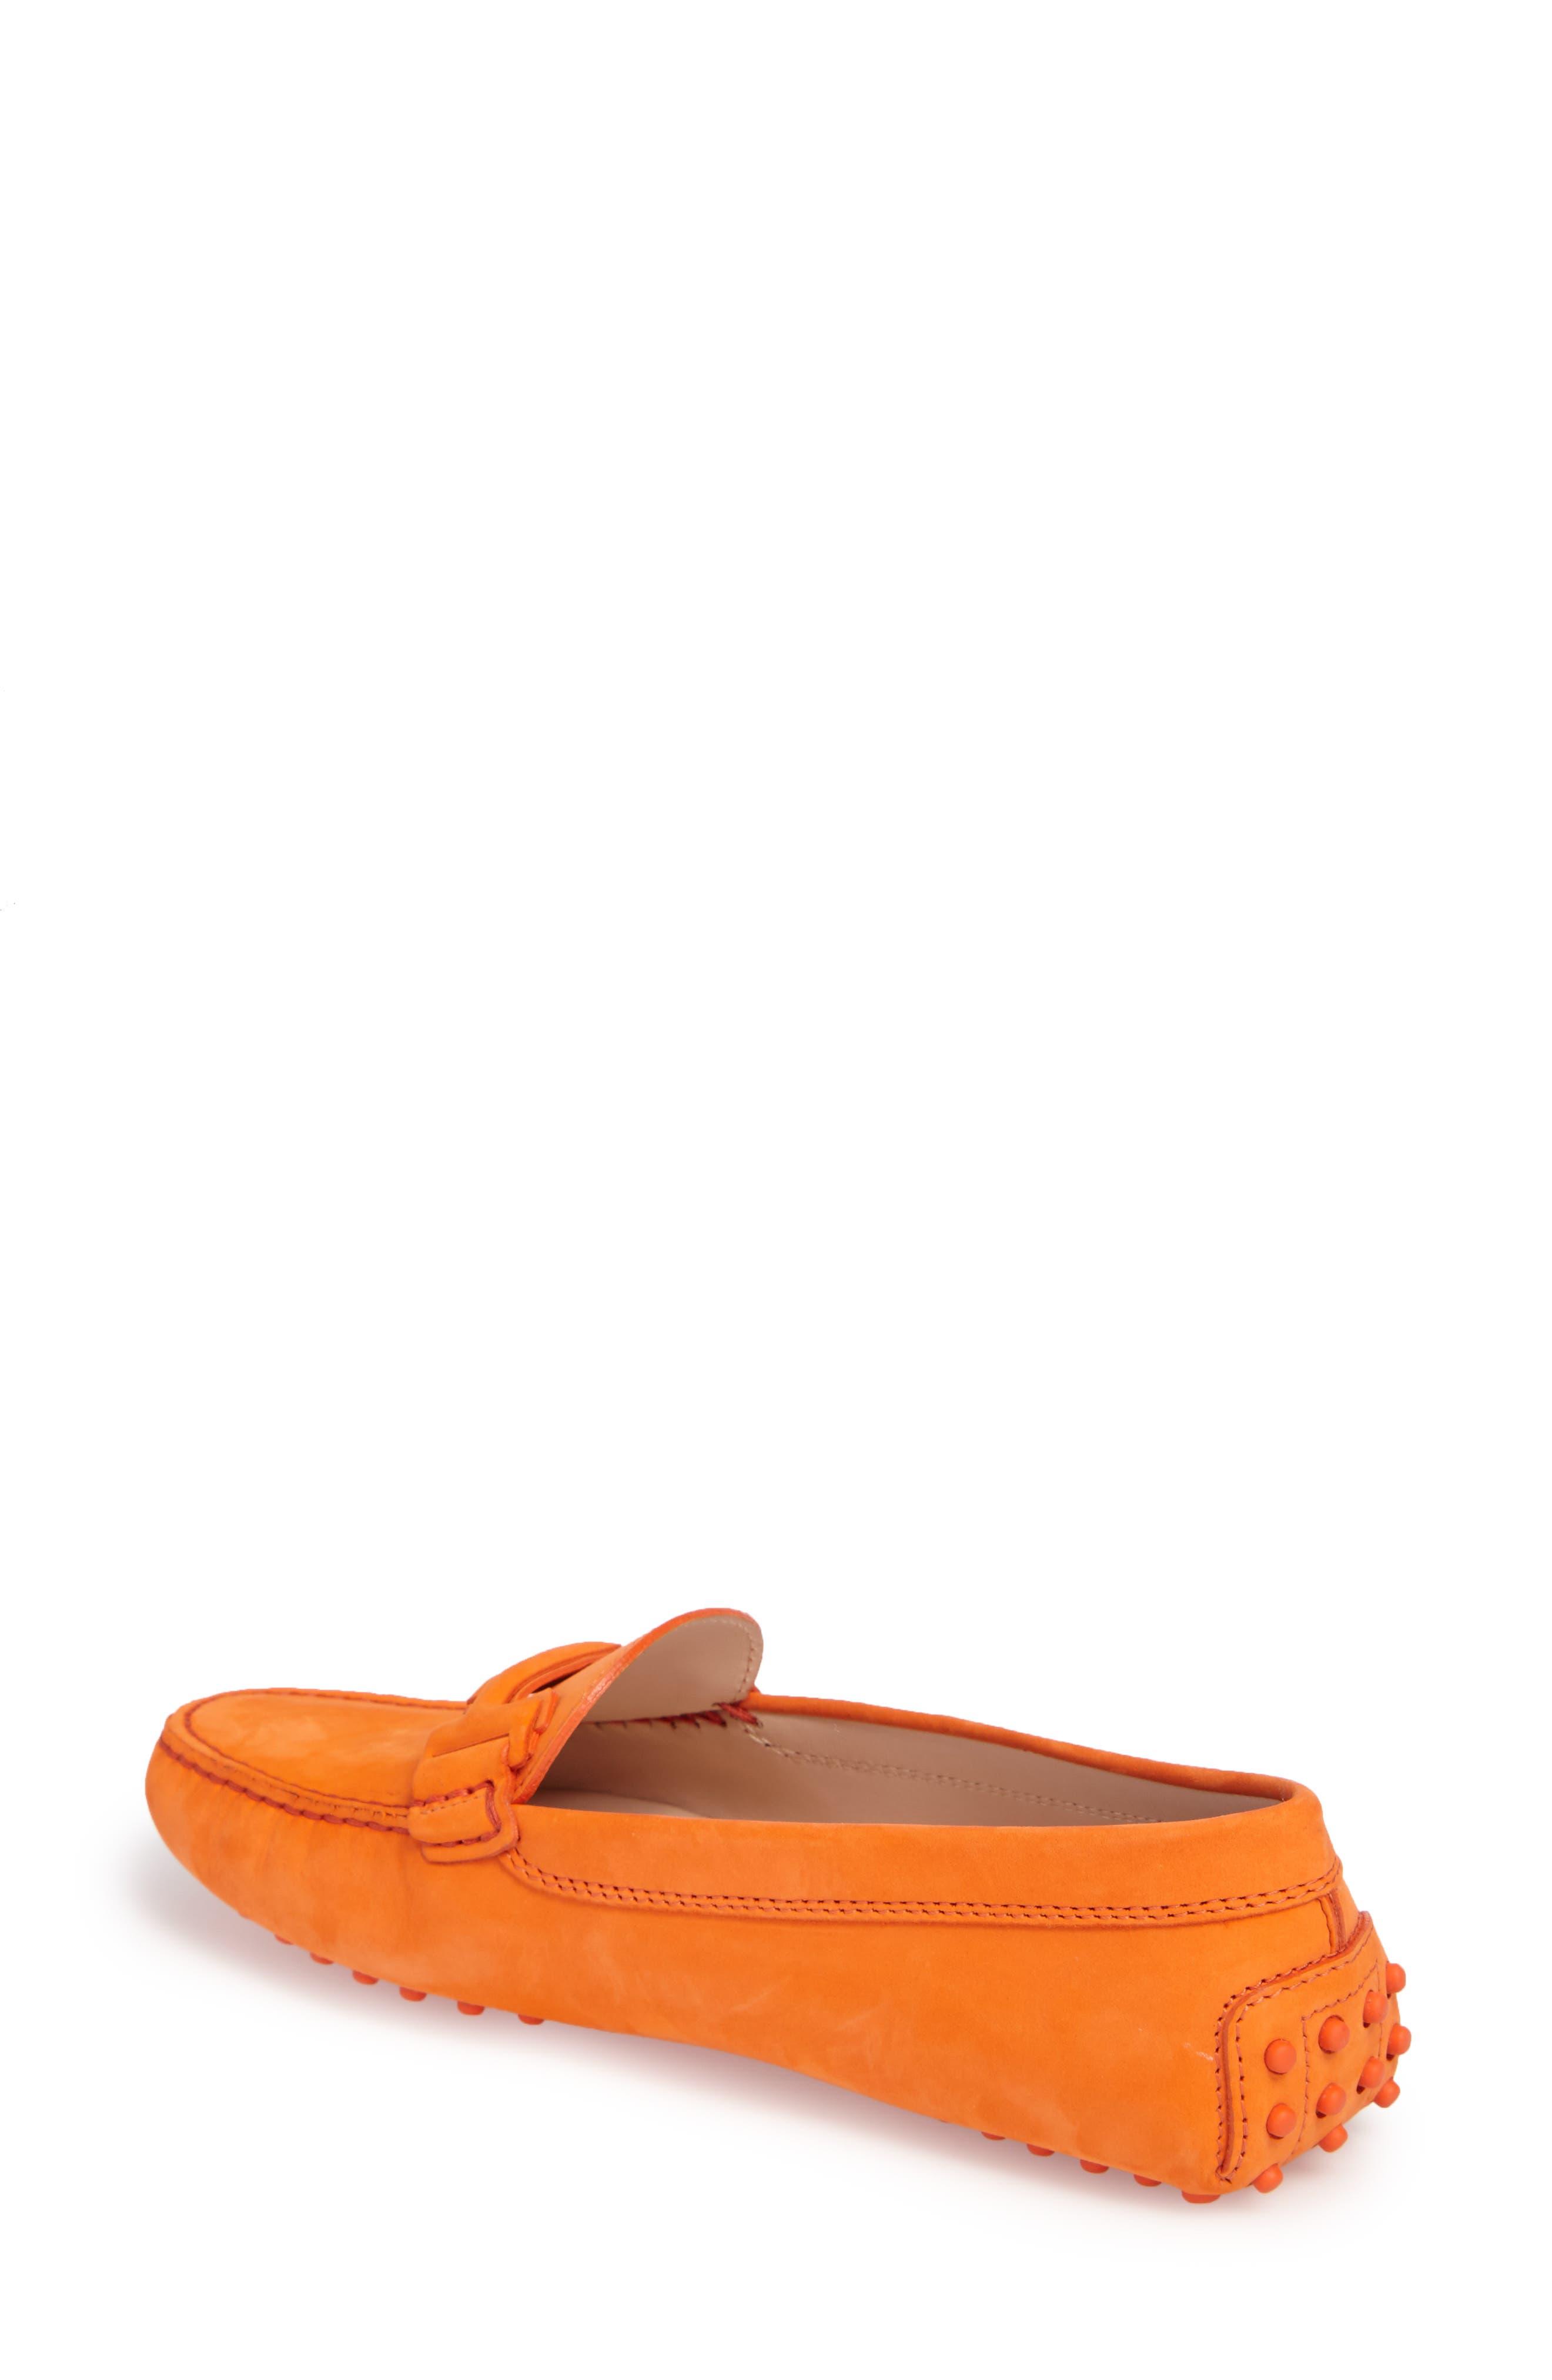 Gommini Covered Double T Loafer,                             Alternate thumbnail 2, color,                             Orange